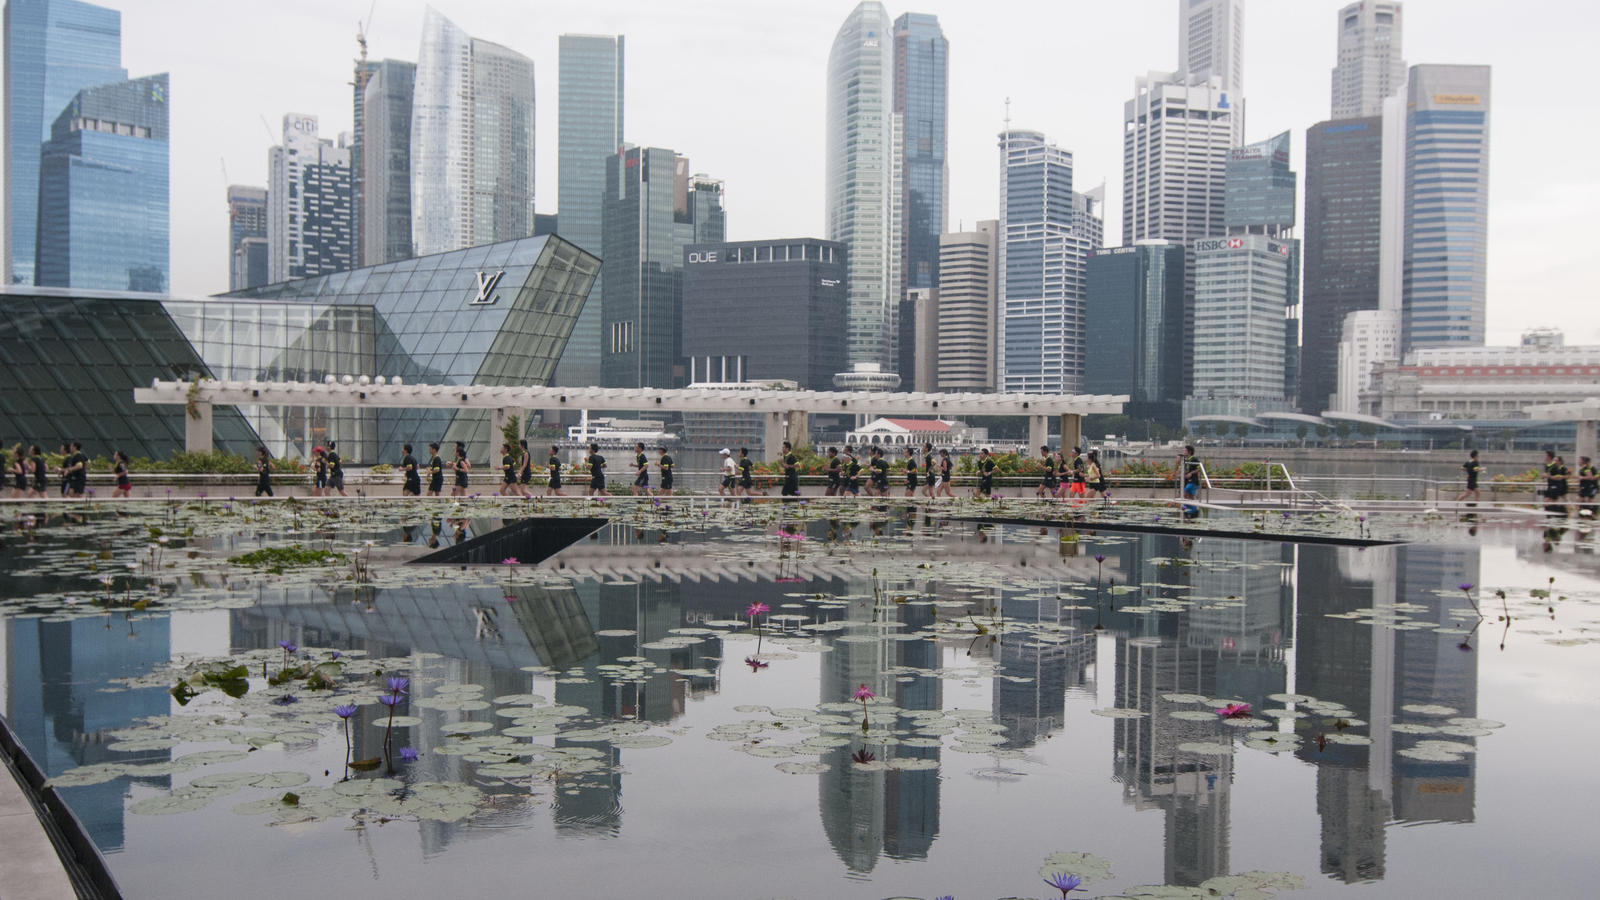 Nike_We_Run_SG_runners_running_along_the_Marina_Bay_Promenade_Boardwalk_with_the_Singapore_Skyline_in_the_background